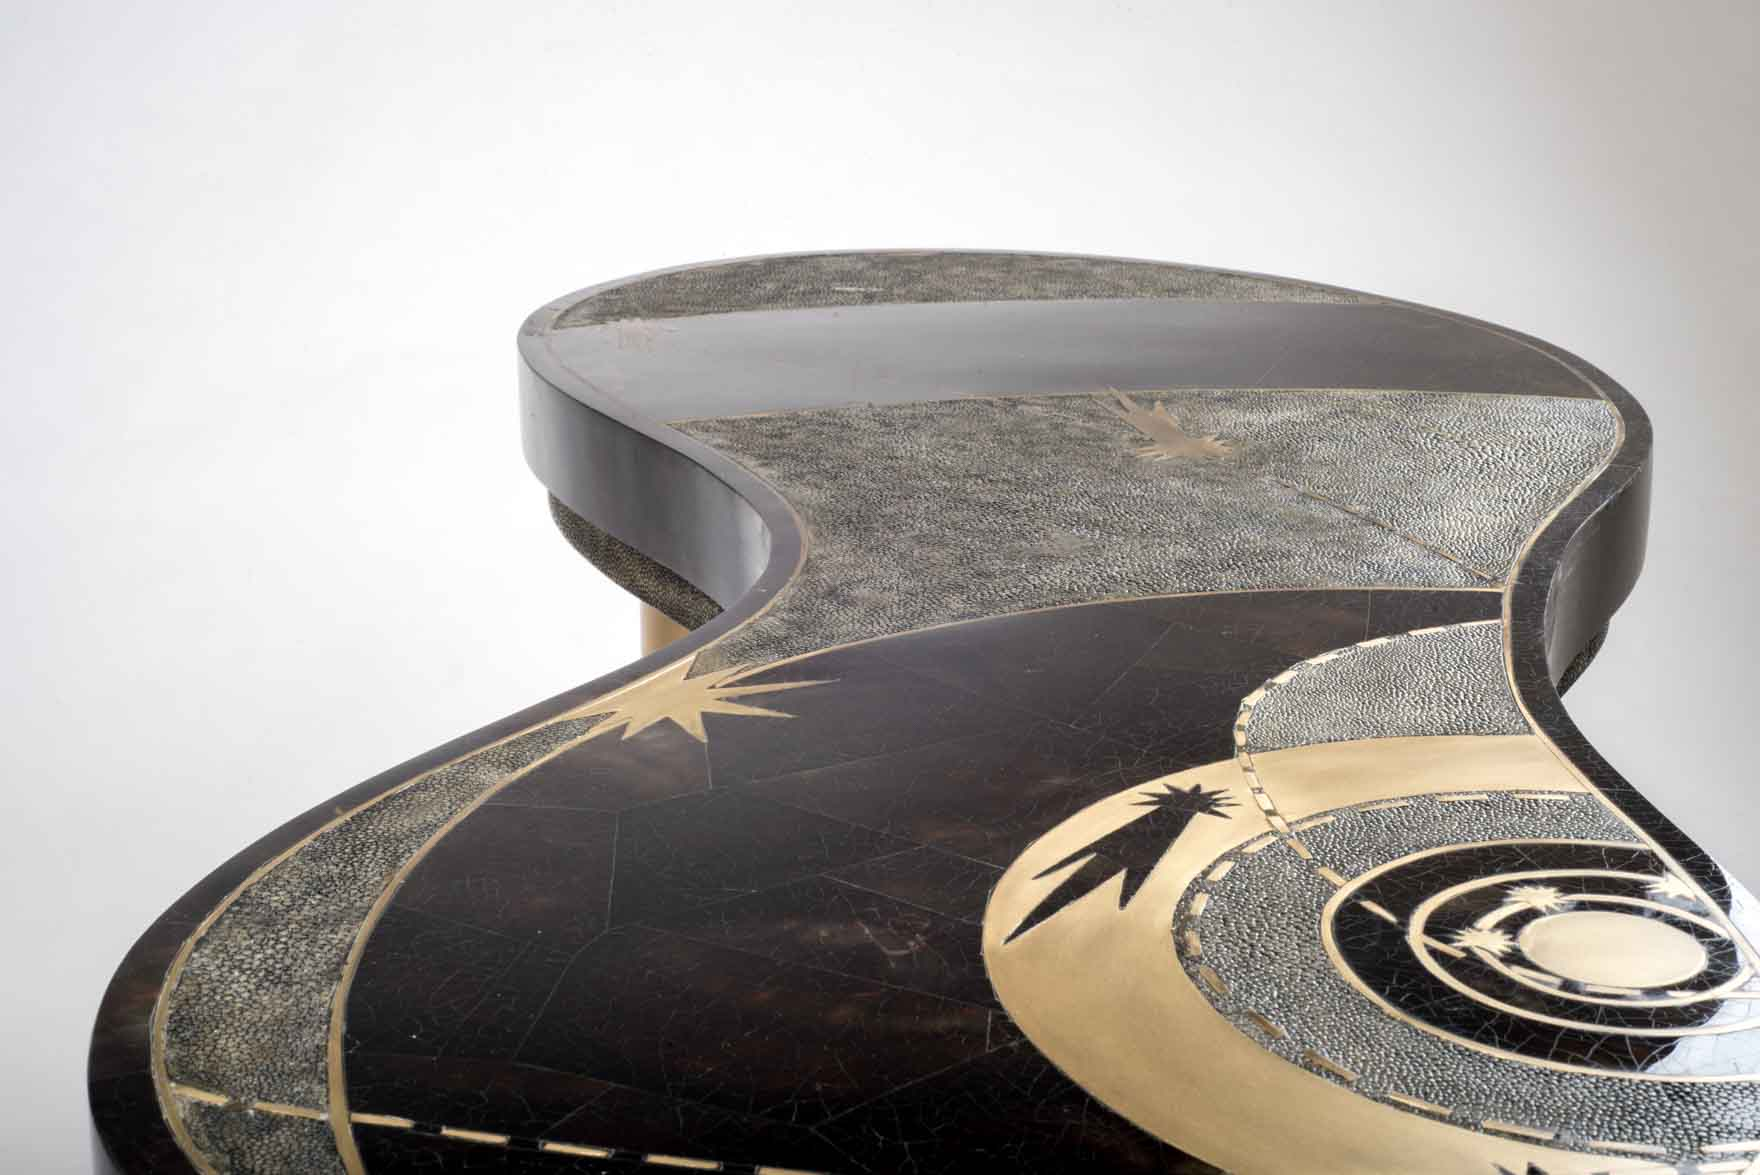 KCF03-D148-V7-Product-shop-Kifu-Paris-Texture-Shagreen-Shell-Interior-Tabletop=Decor-Accesories-Furniture.jpg